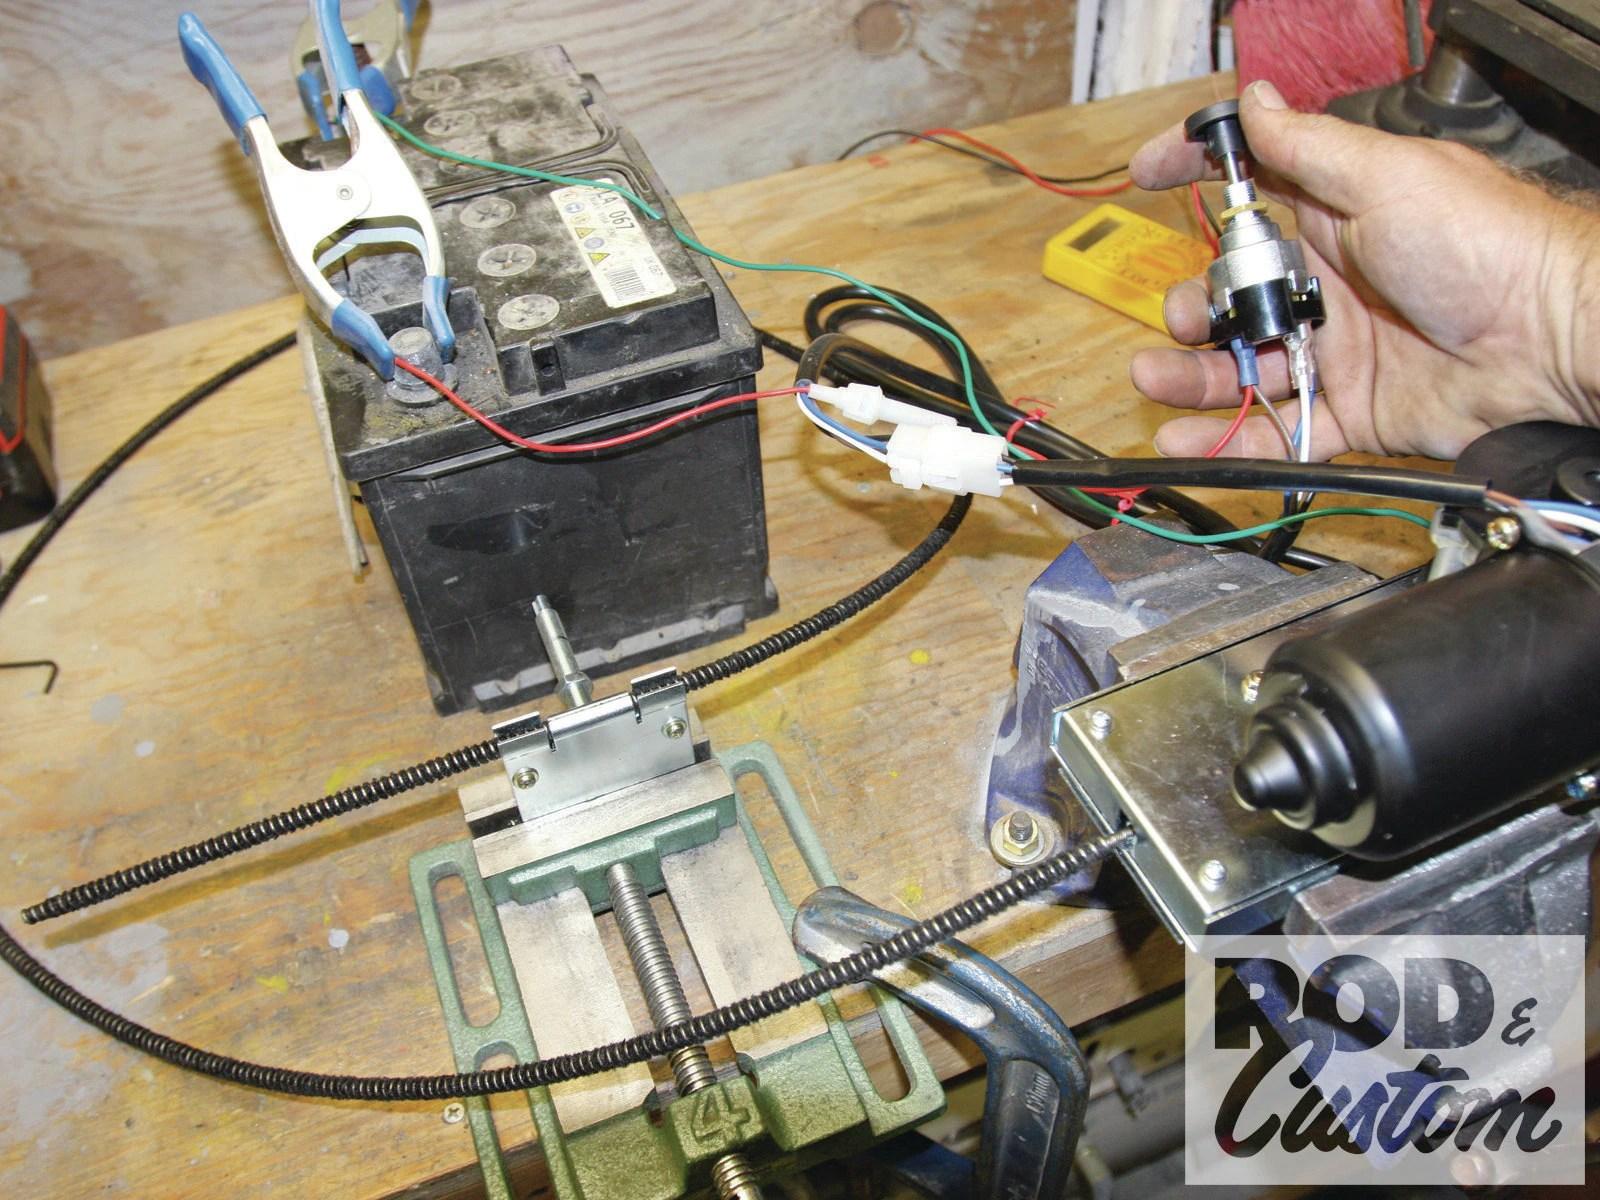 hight resolution of ez wiring install ez wiring wiper kit installation ez wiring install senor aguas ez wiring harness install